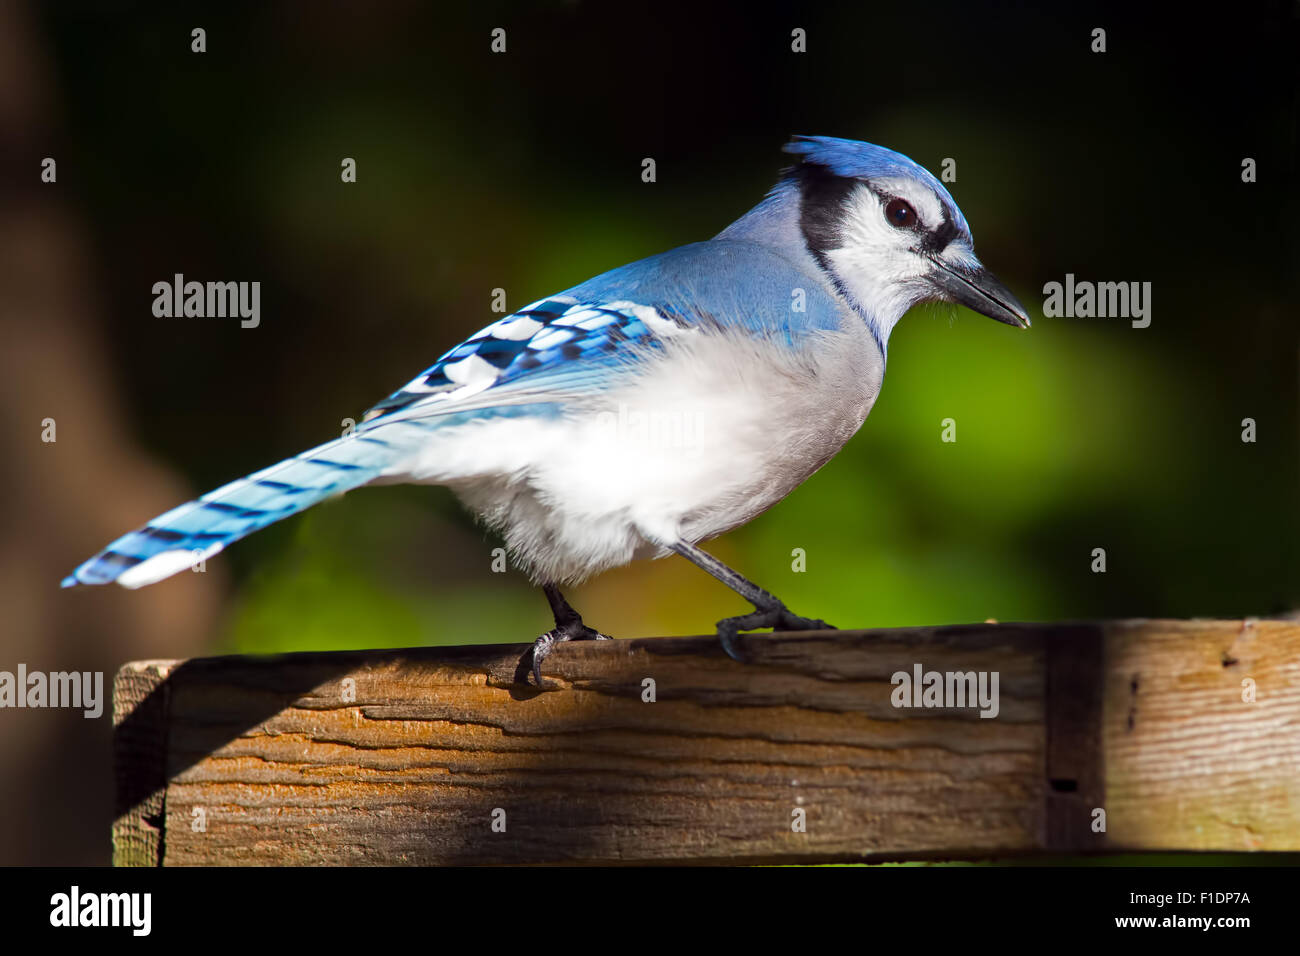 Blue Jay on Platform Feeder - Stock Image